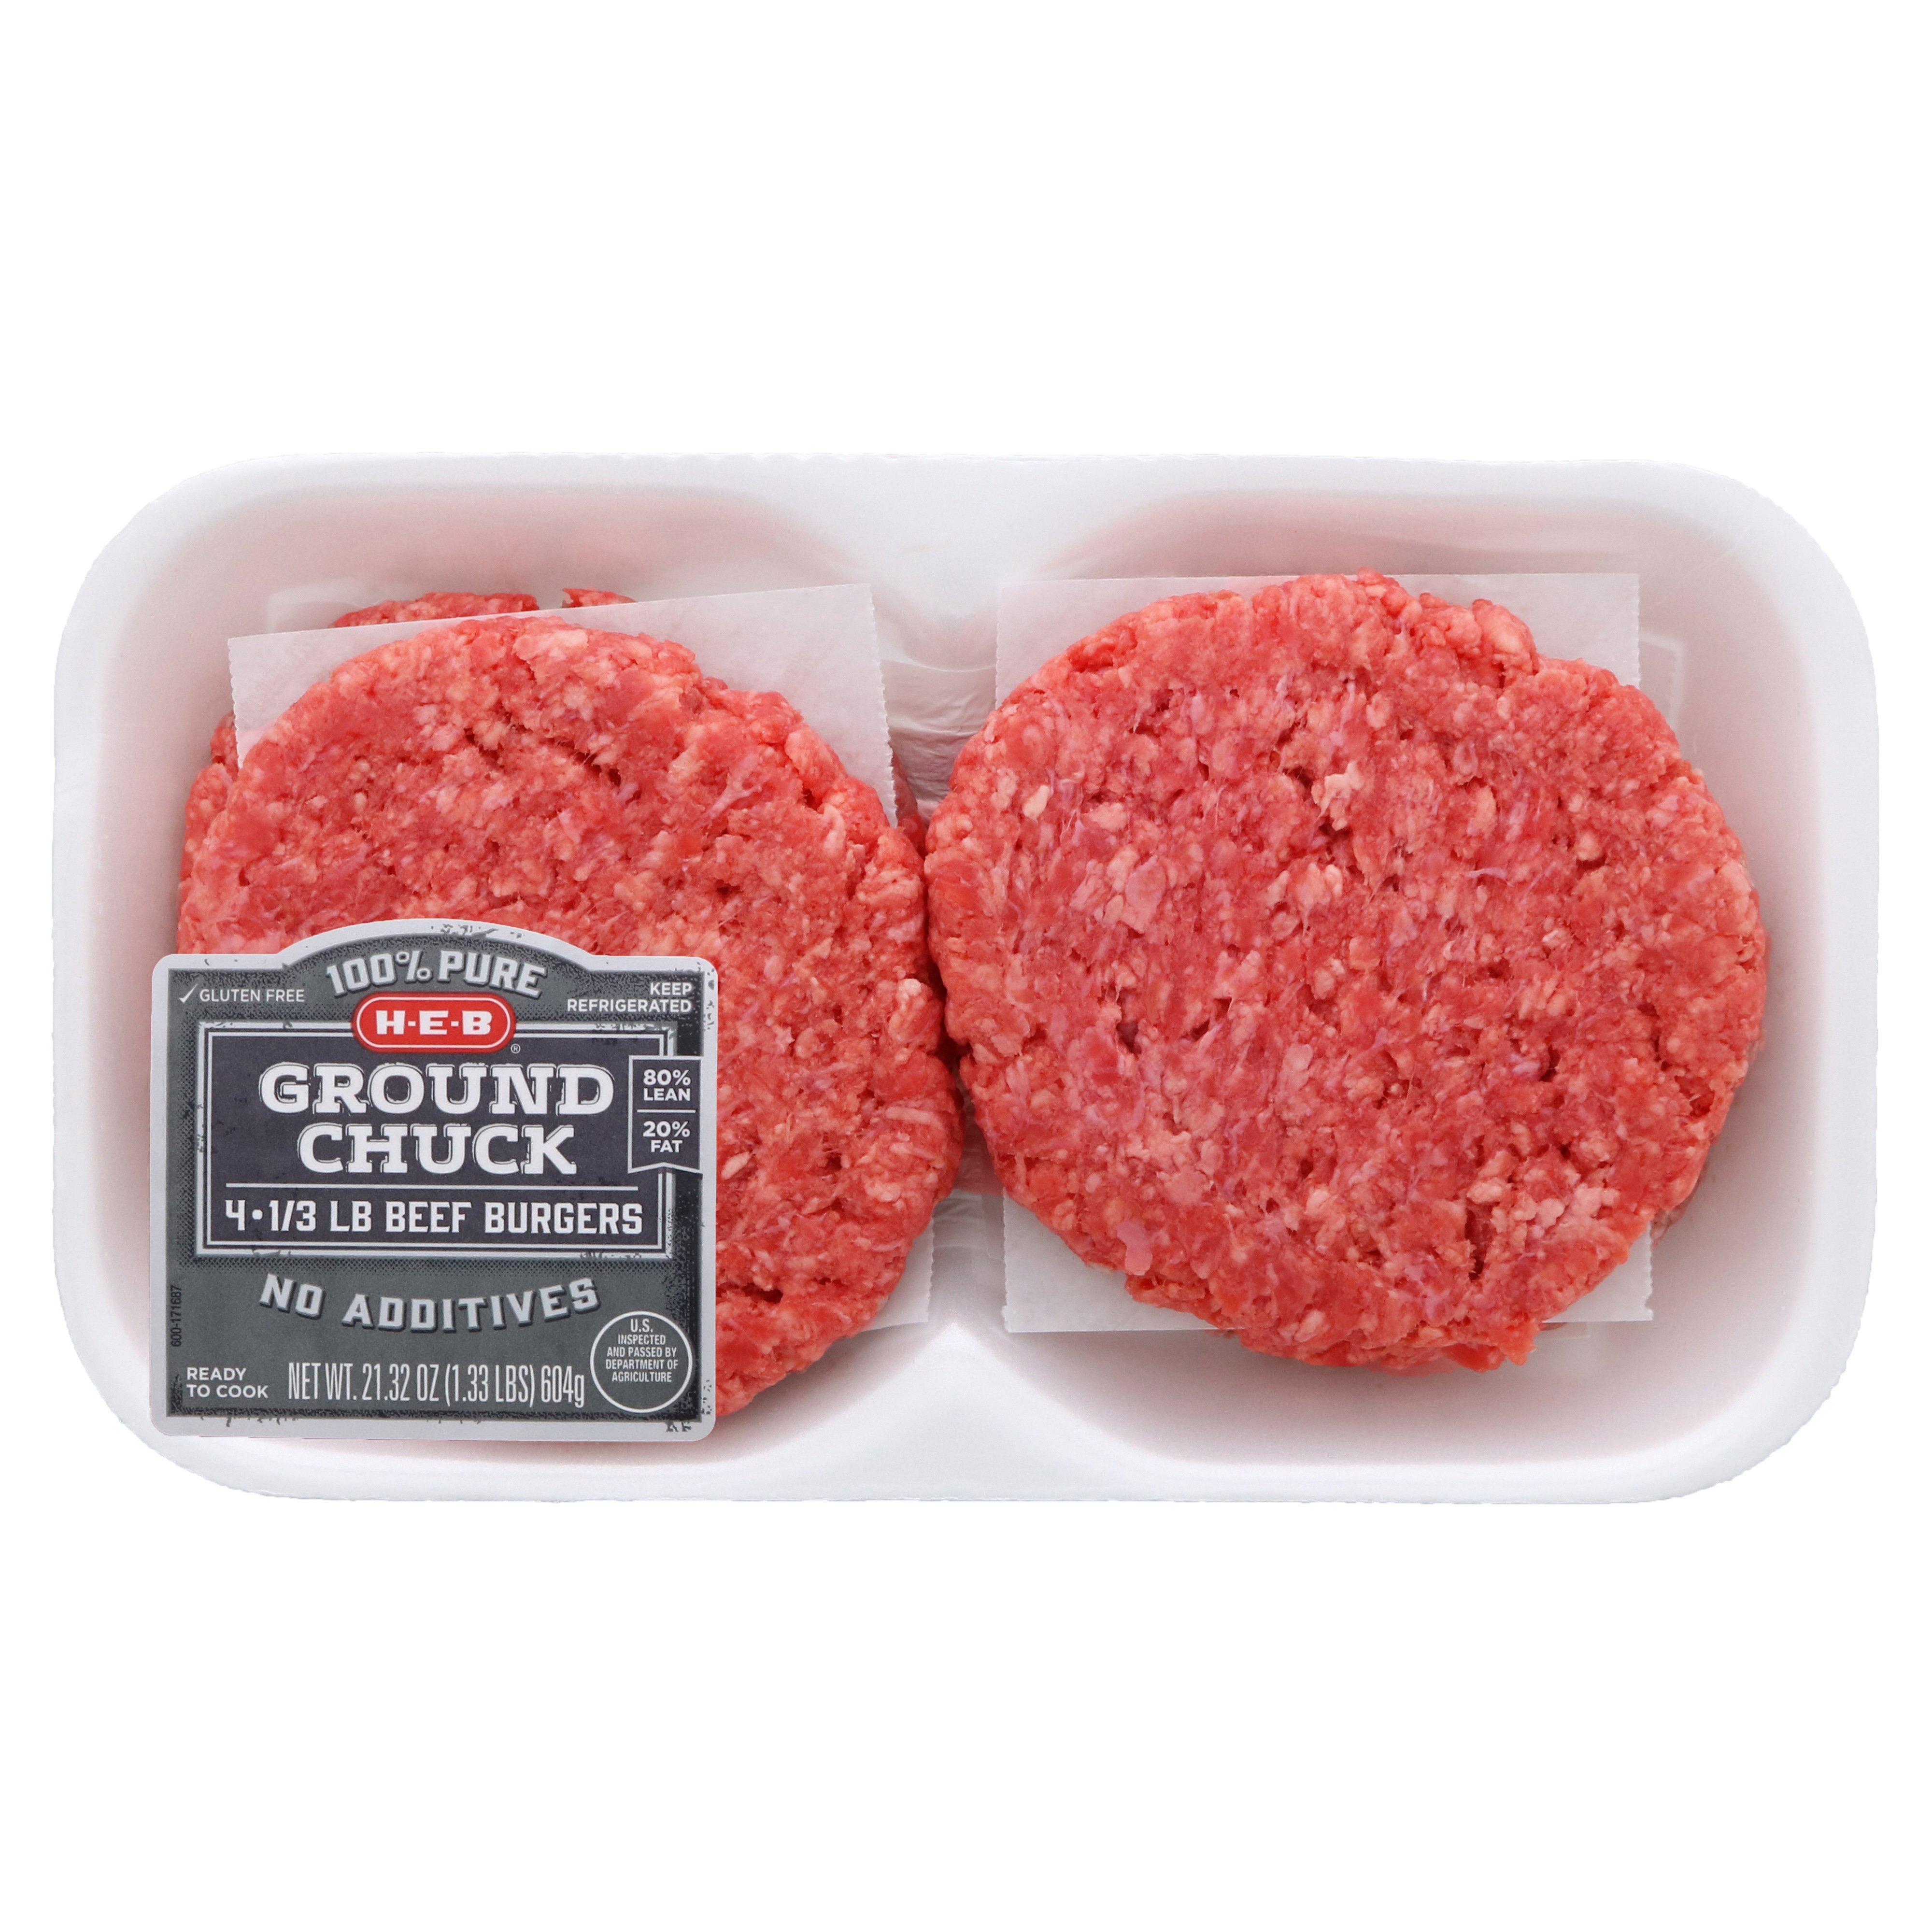 H E B Ground Chuck 1 3 Lb Beef Patties 80 Lean Shop Beef At H E B